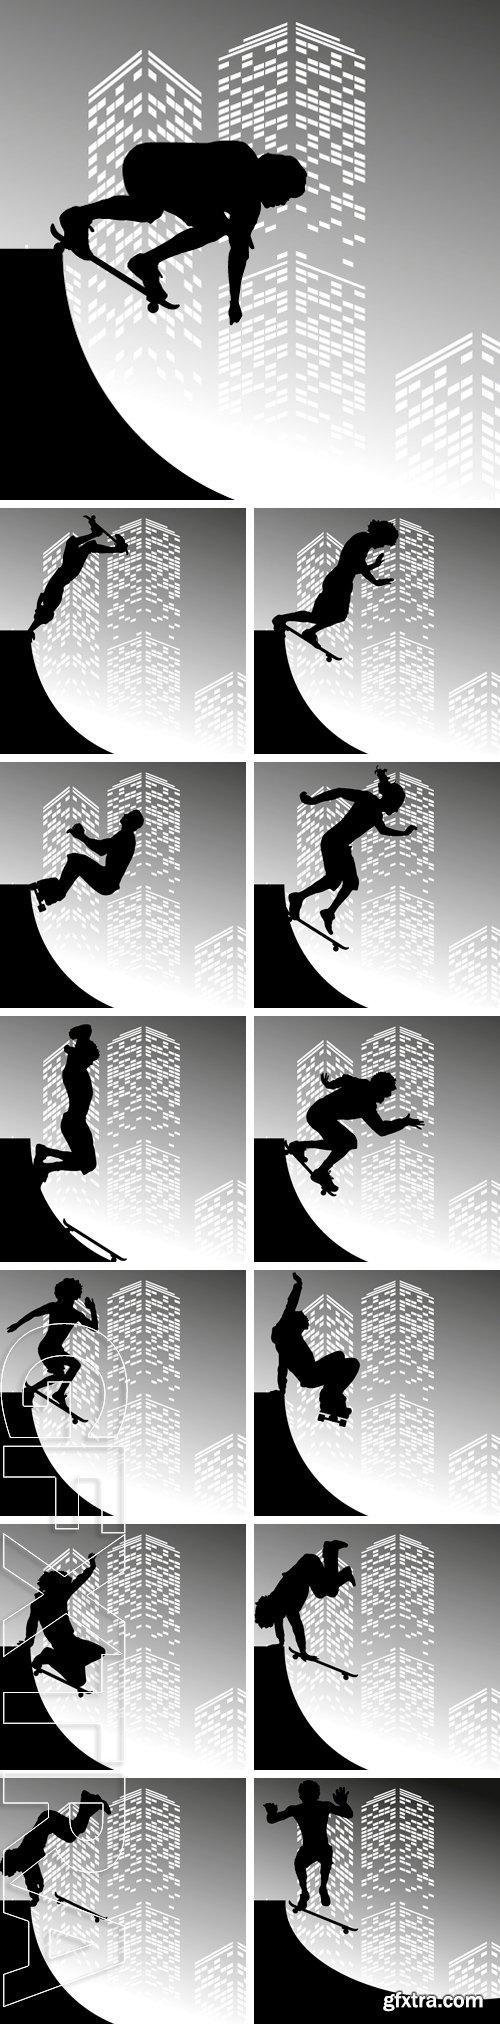 Stock Vectors - Vector silhouette skateboarder on grey skyscraper background